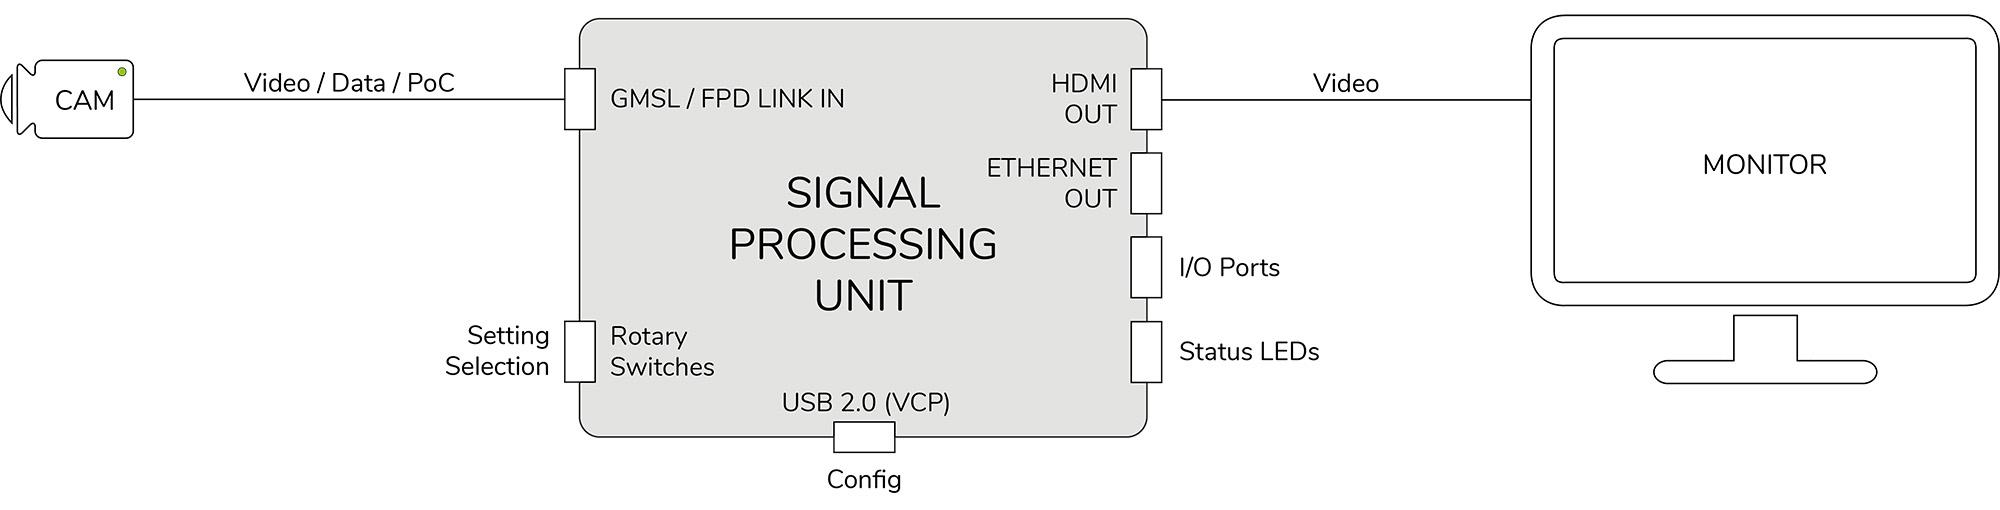 TZ Electronic Systems GmbH - SPU0080 Blockschaltbild